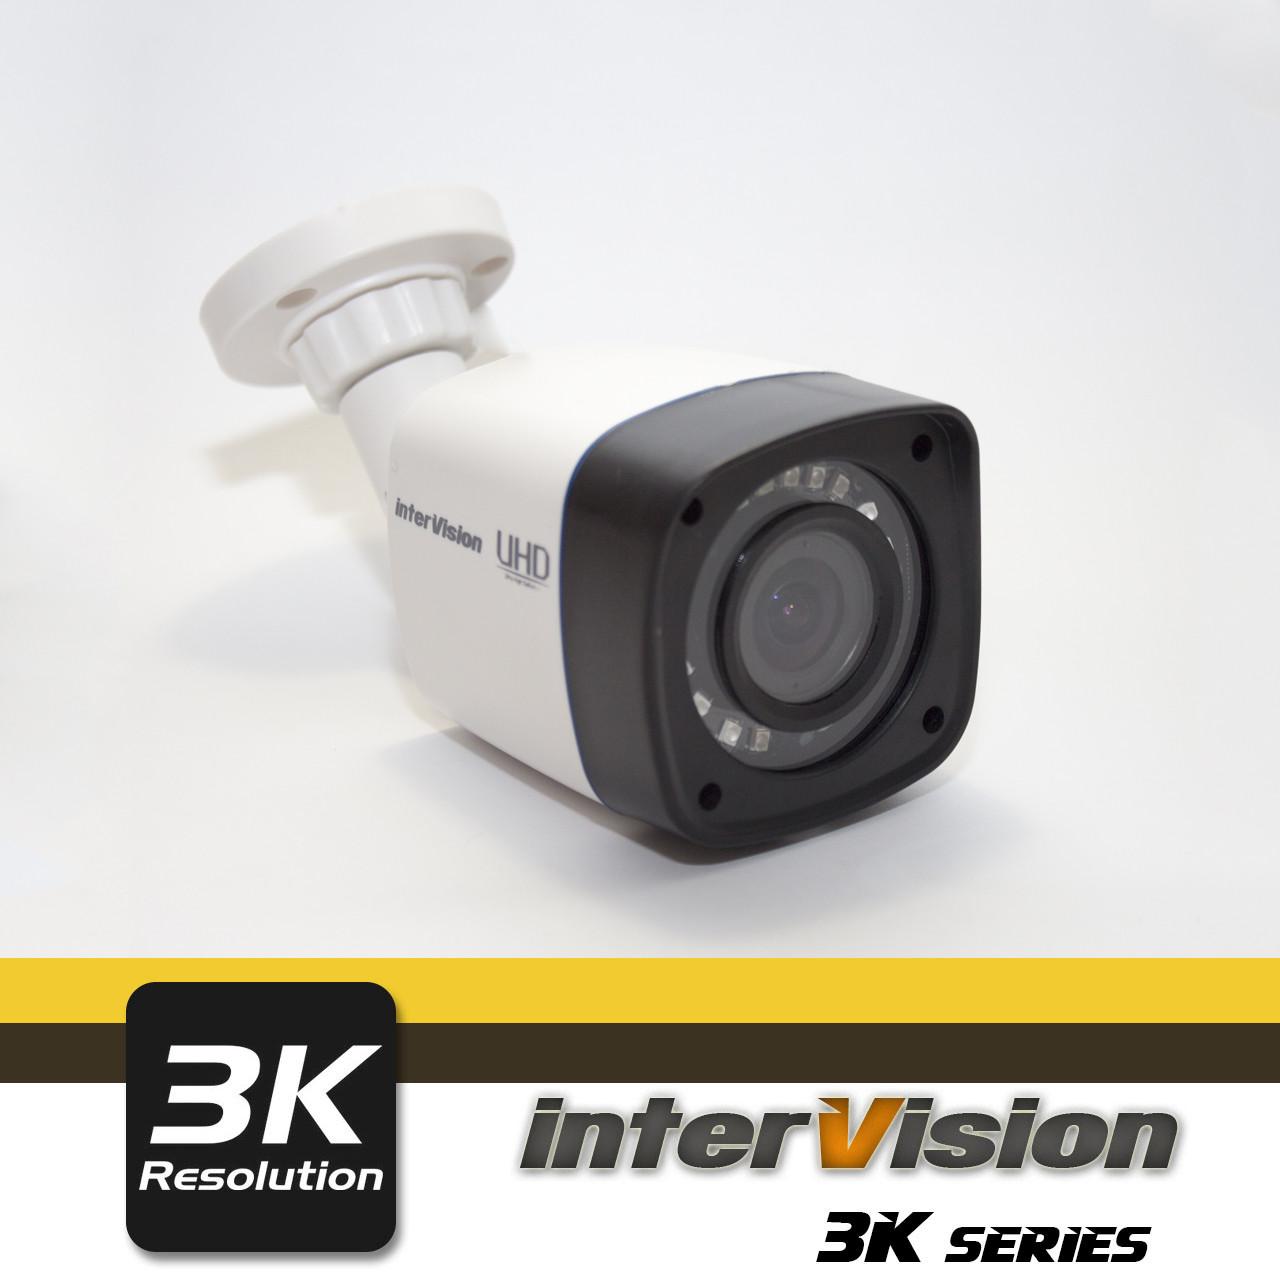 UHD-3K-3WI уличная 4MP видеокамера, угол обзора 130°,Ик  28 метров